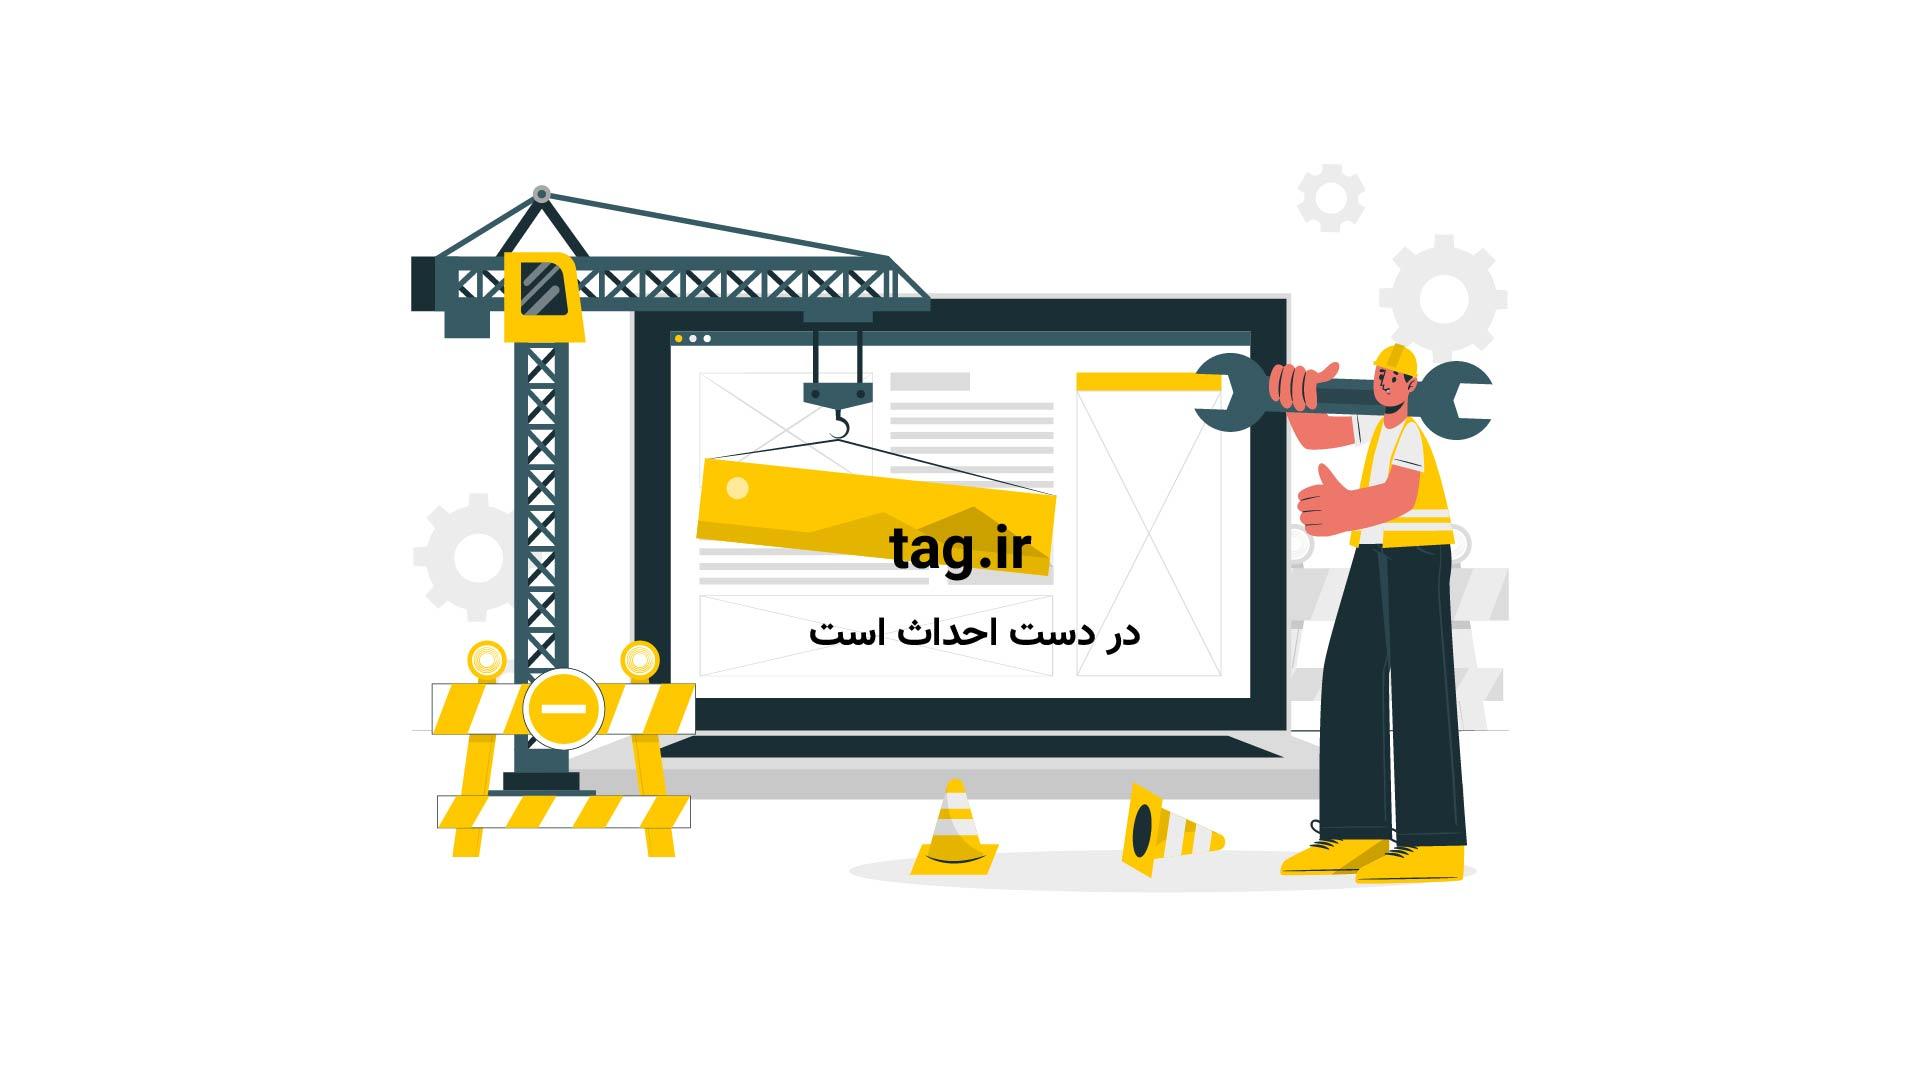 امام خمینی (ره) | تگ